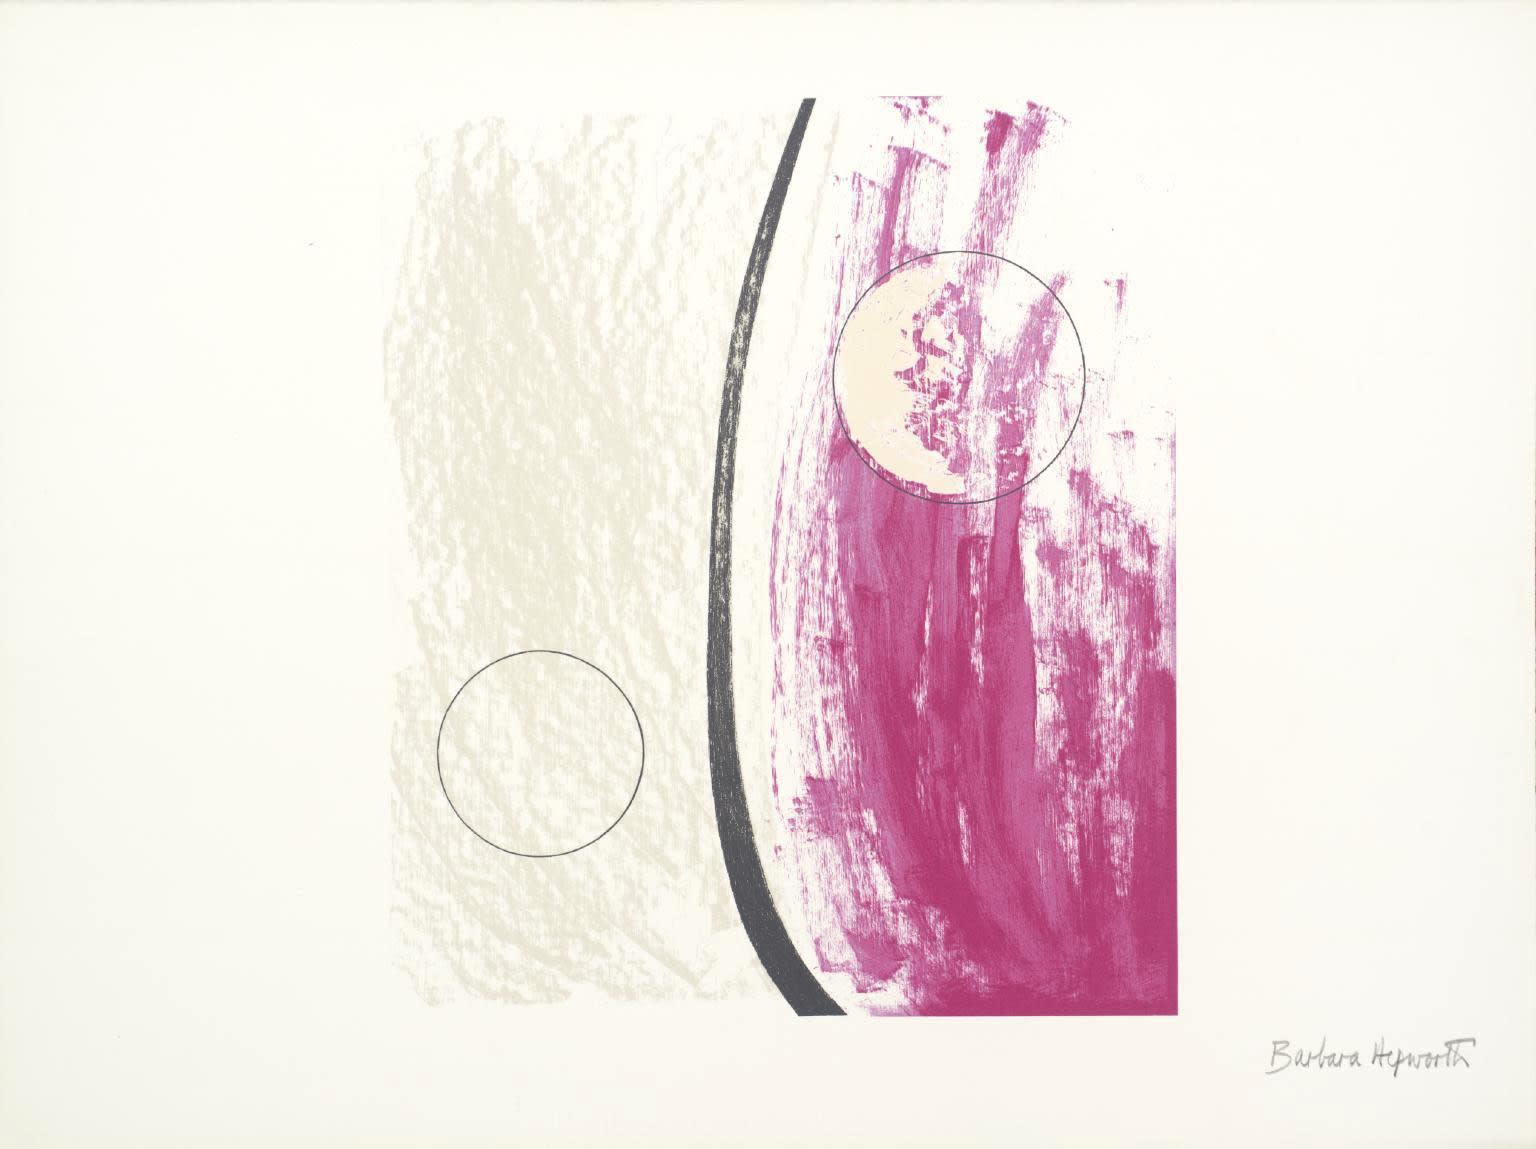 Barbara Hepworth, Orchid, 1970